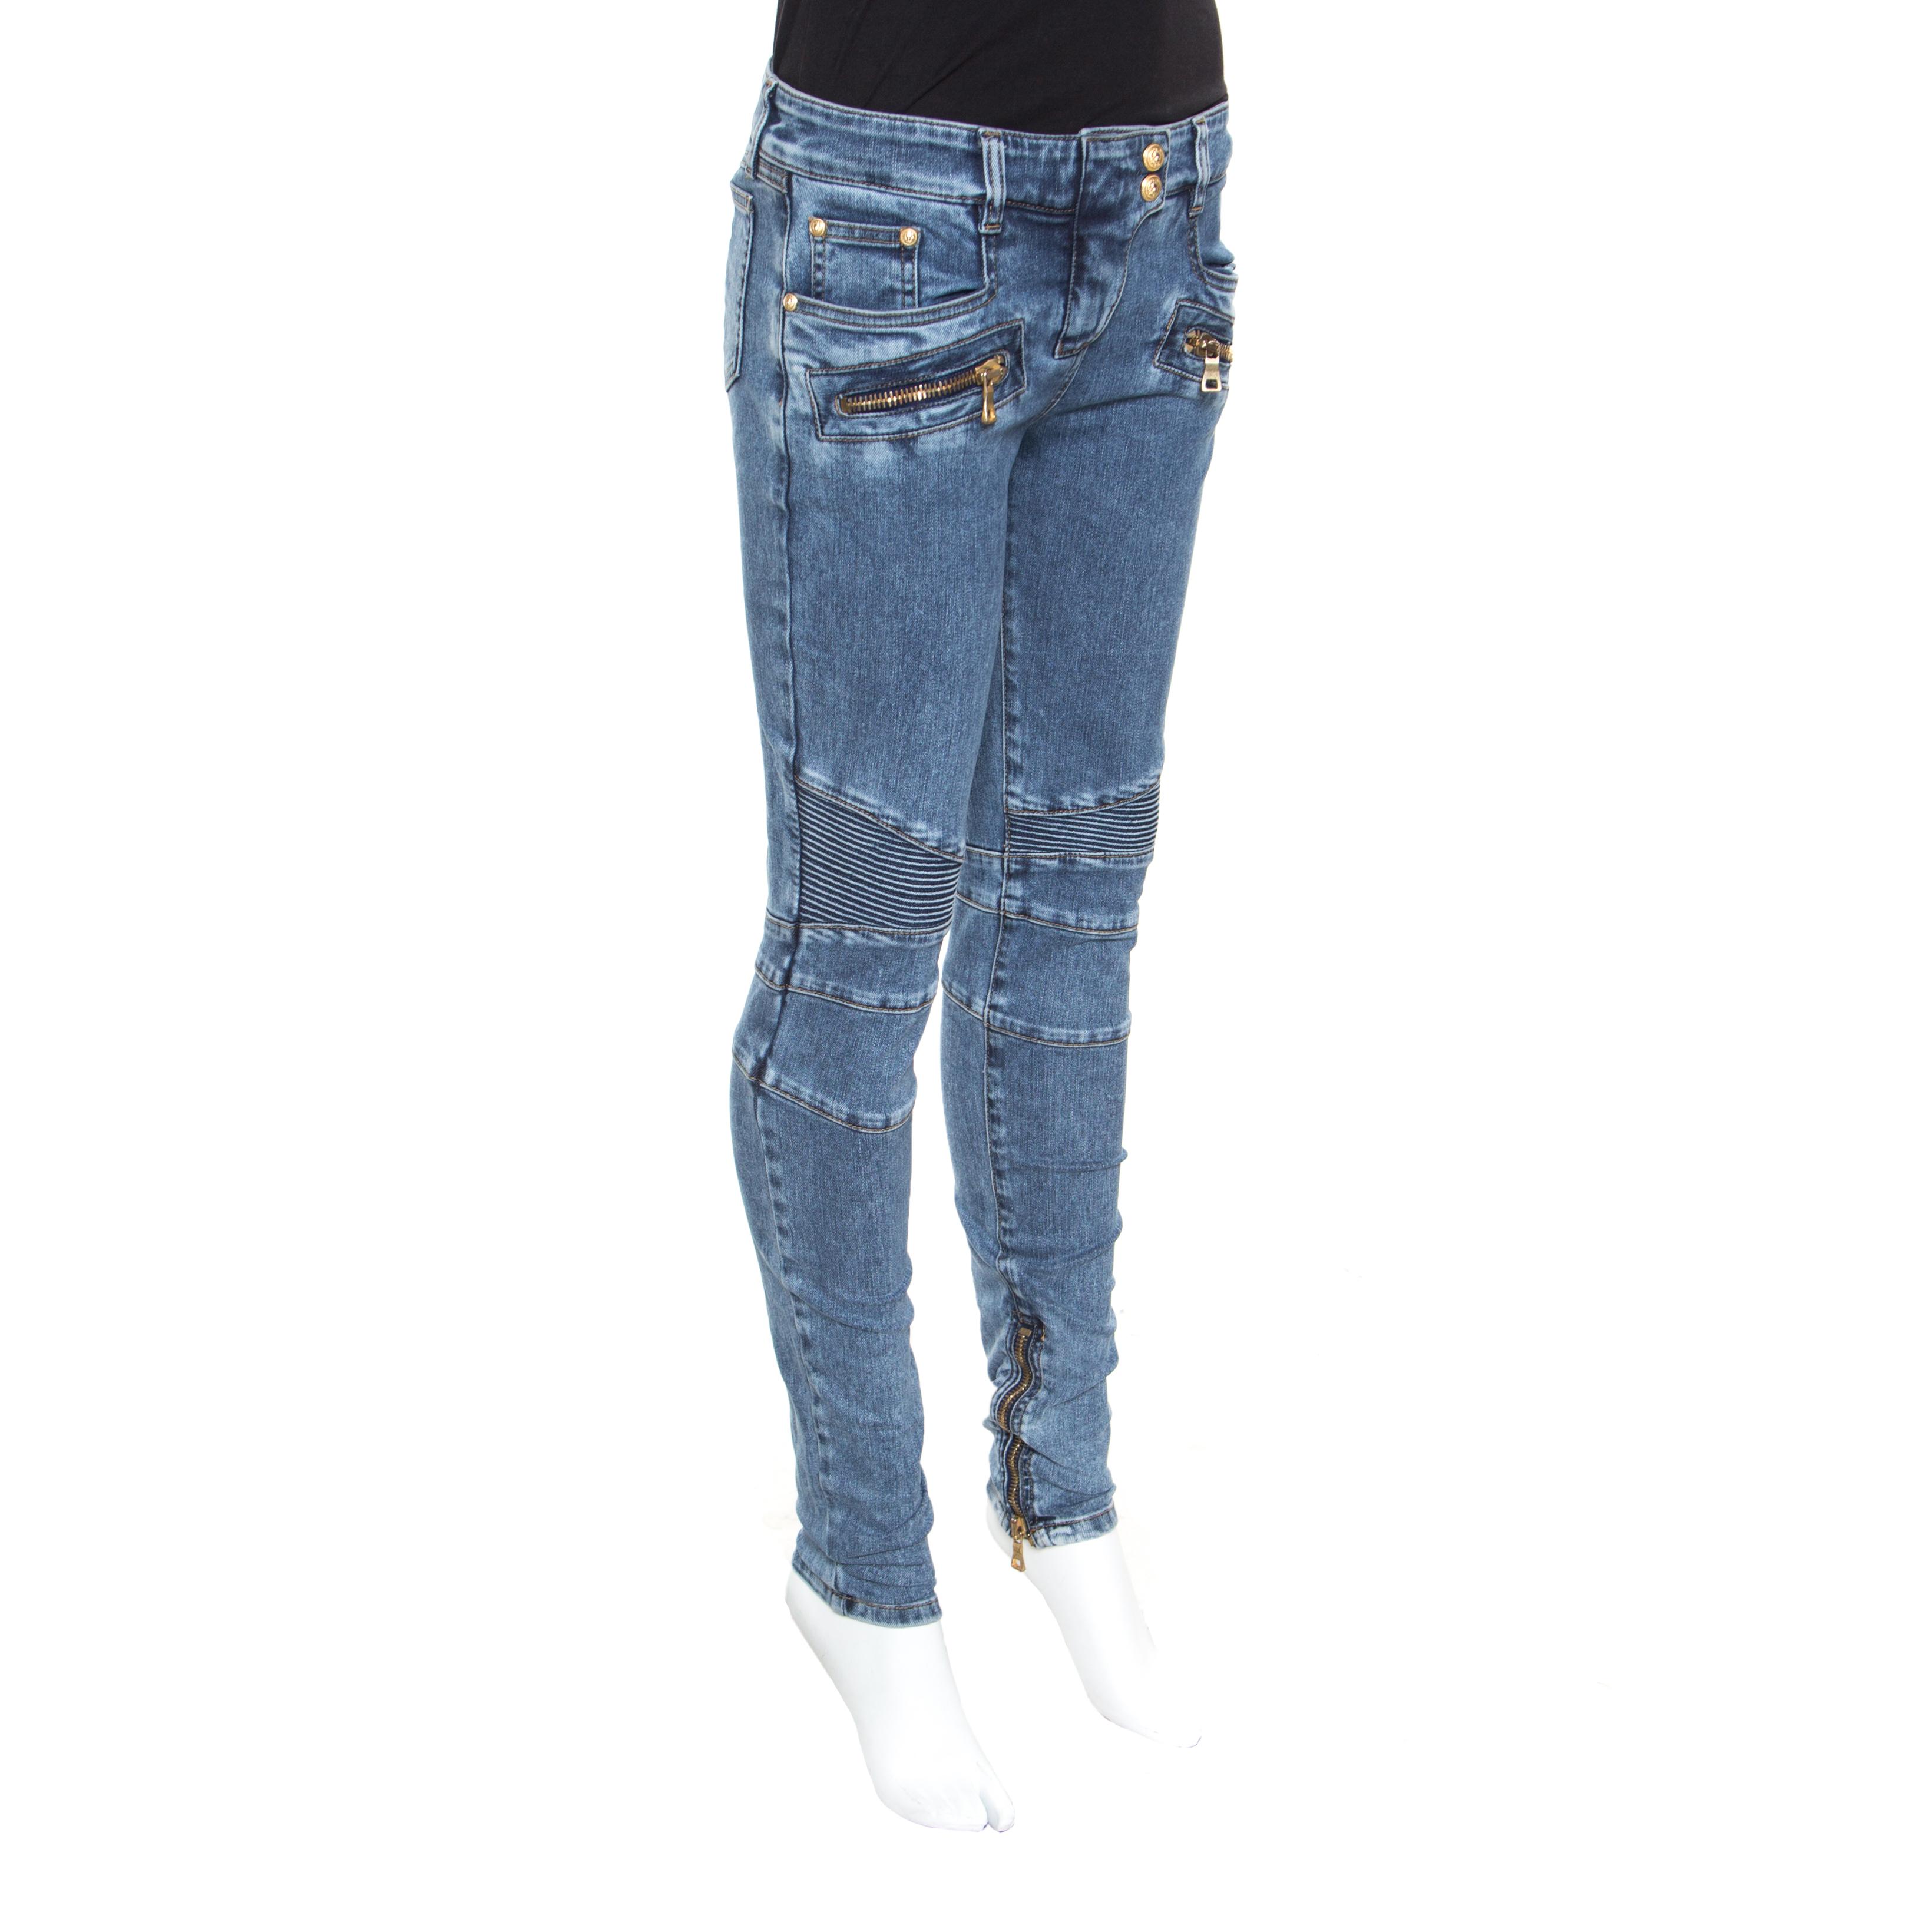 Balmain Indigo Washed Denim Pin tucked Panel Zip Detail Skinny Biker Jeans S